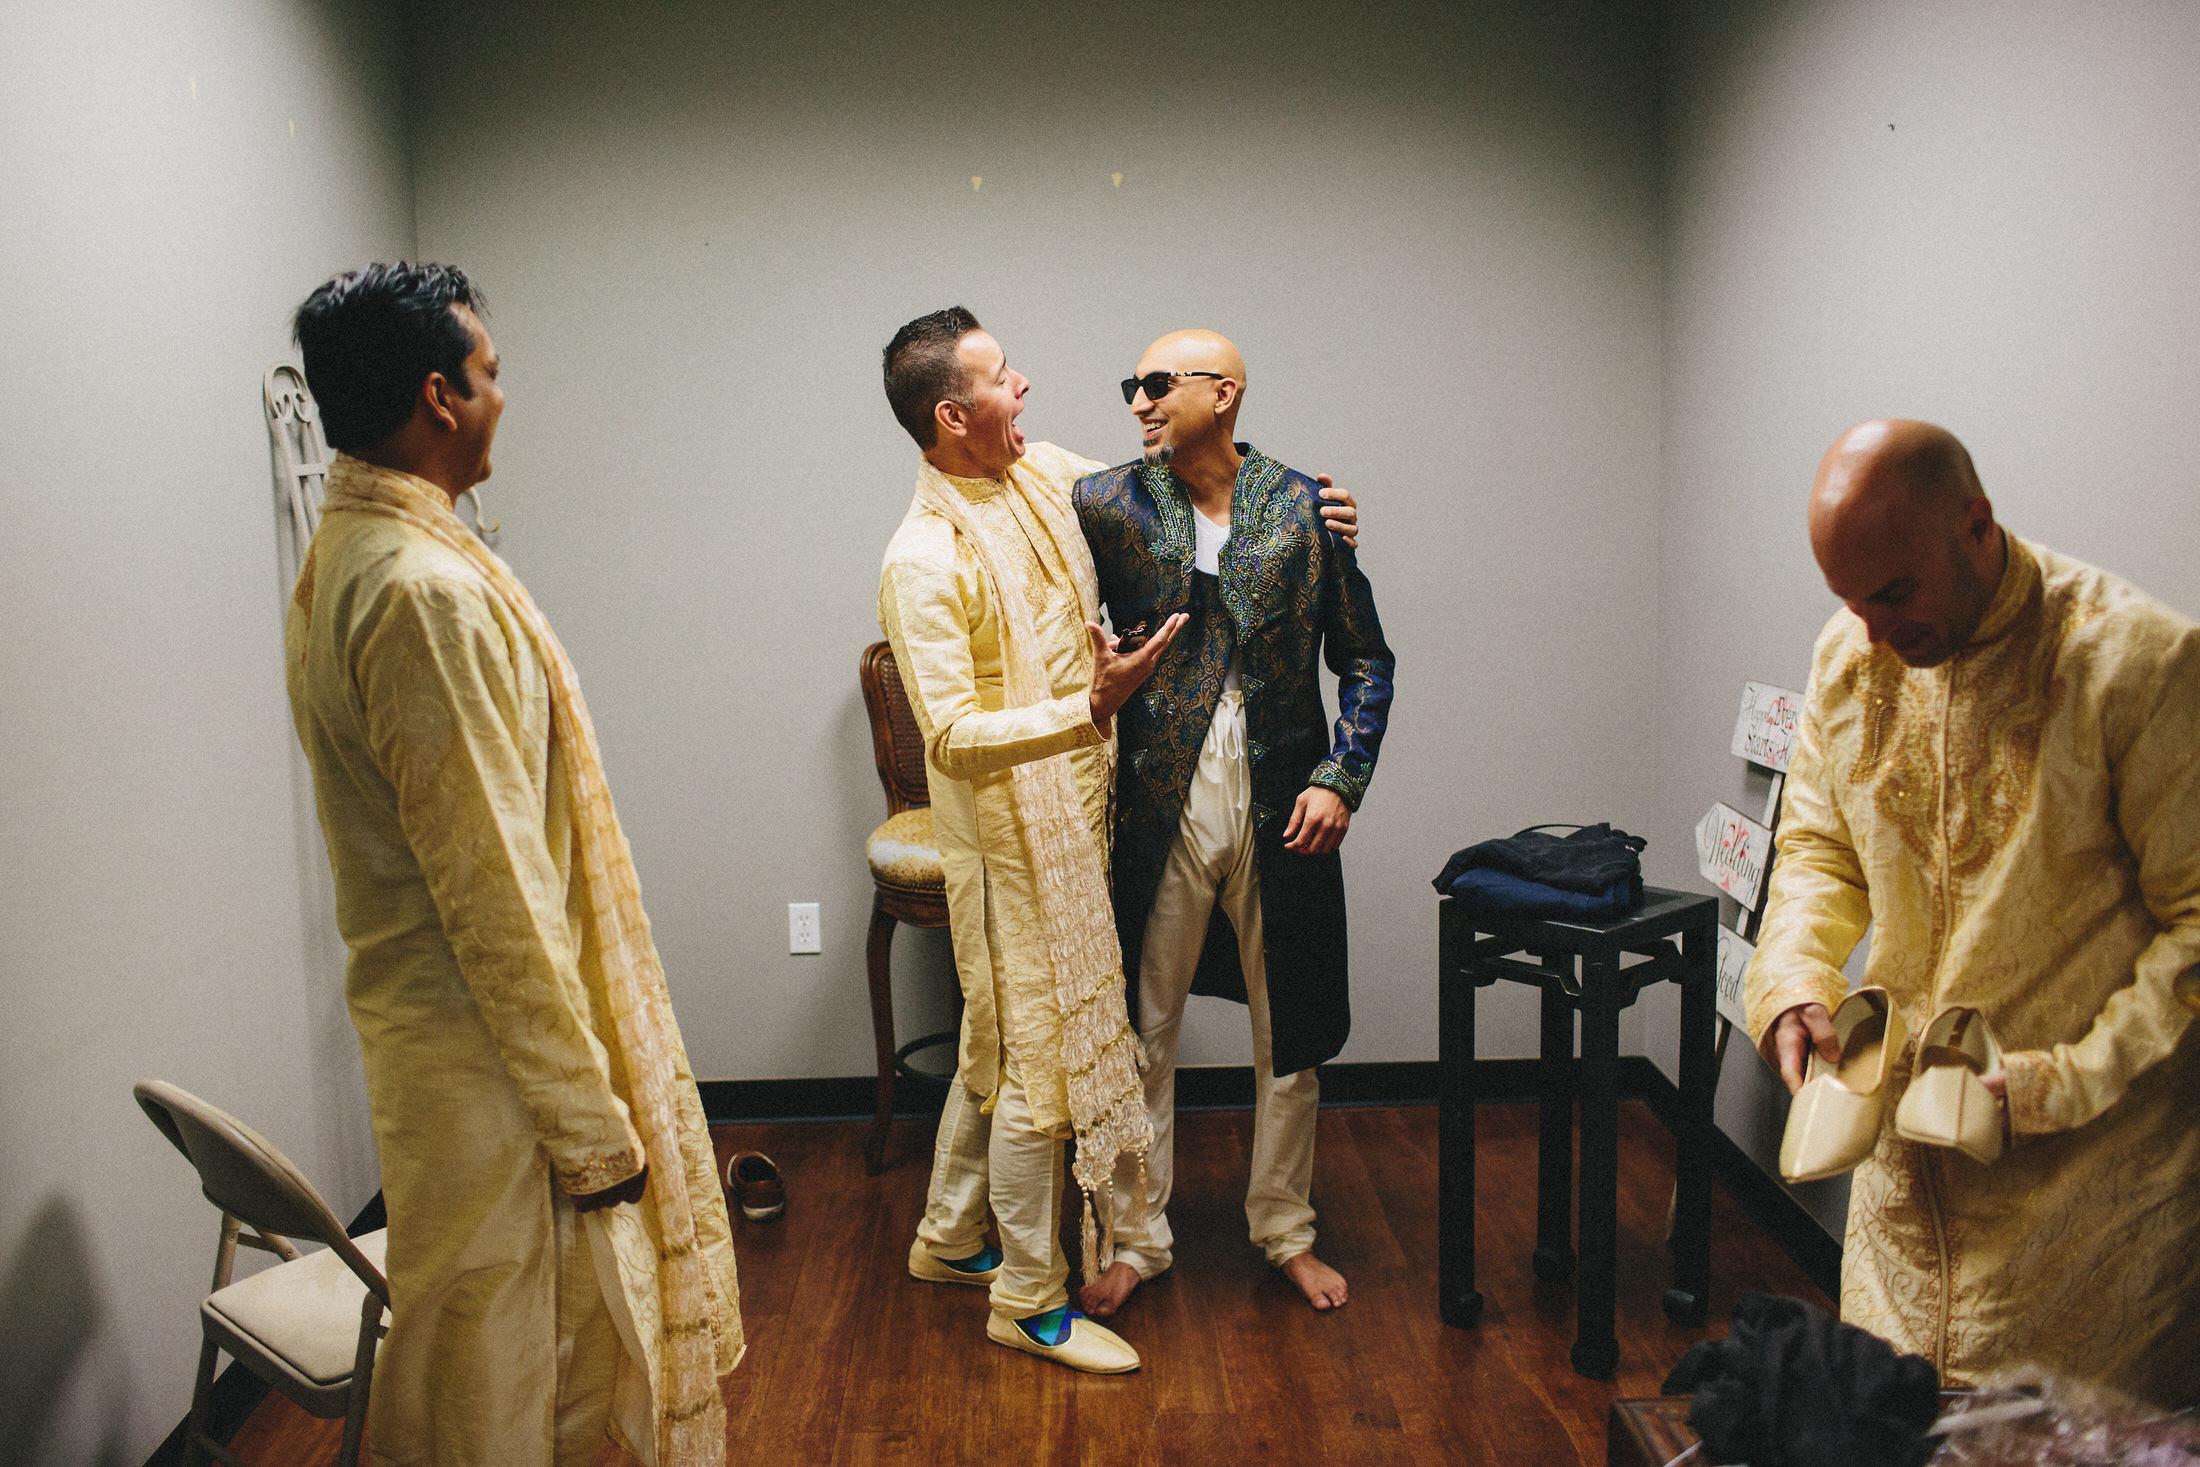 Modern-Indian-Serra-Plaza-wedding-016.jpg